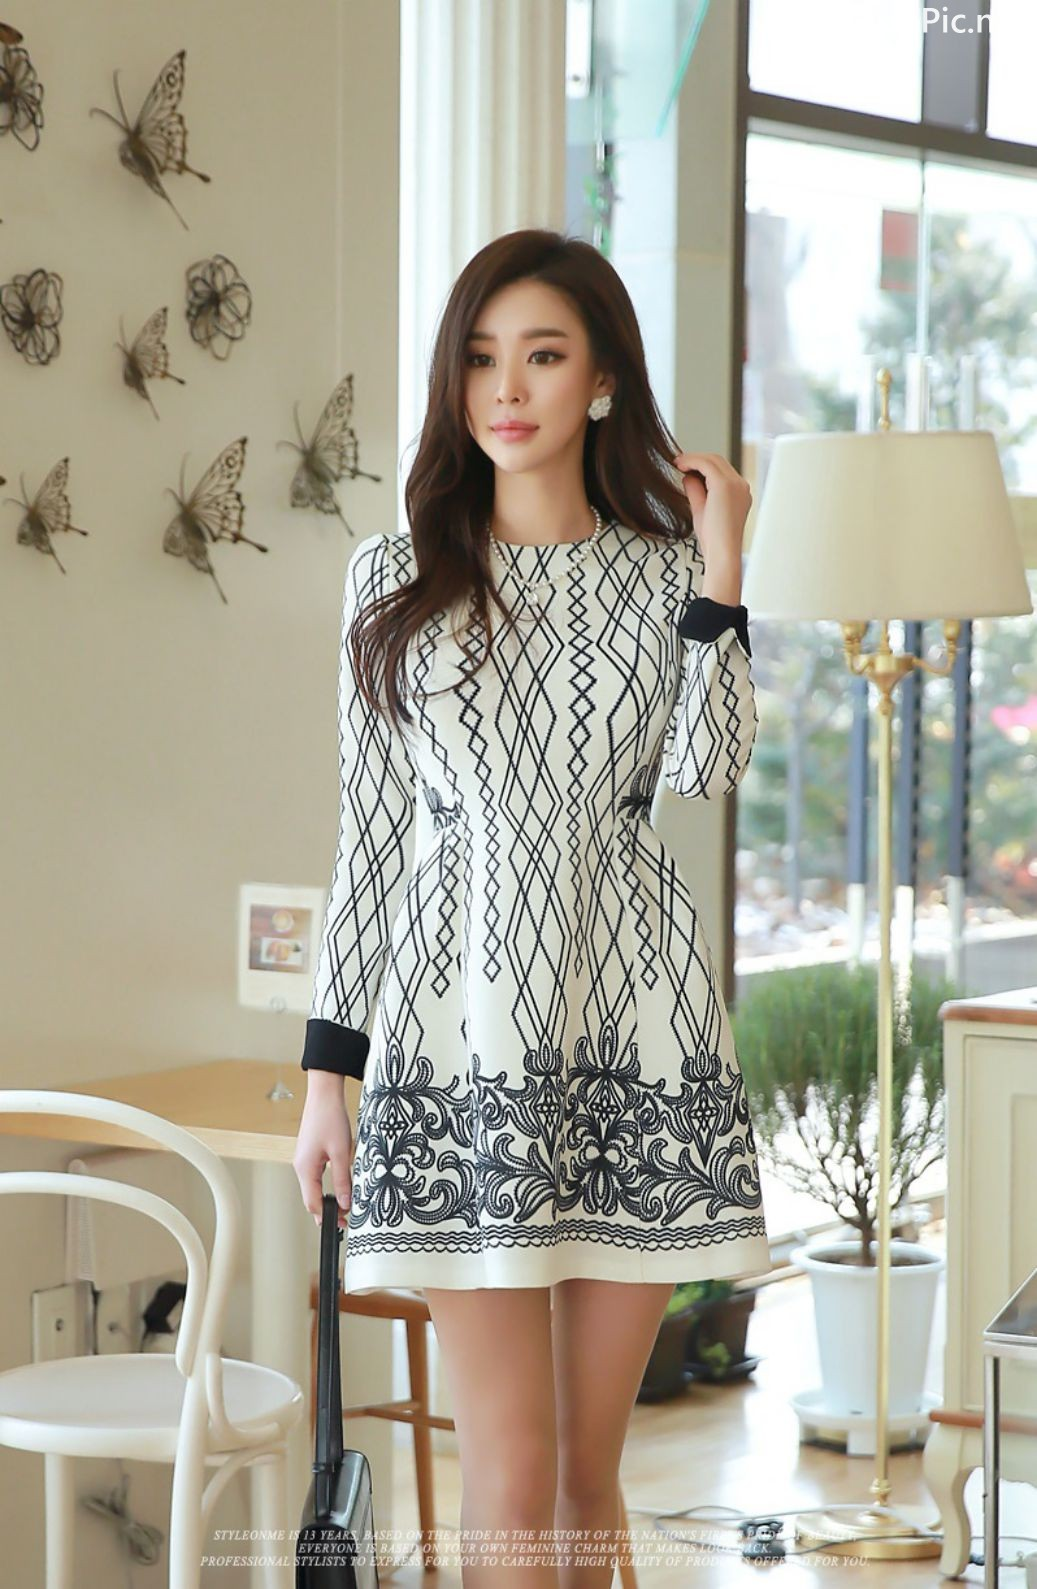 Image-Korean-Fashion-Model-Park-Da-Hyun-Office-Dress-Collection-TruePic.net- Picture-6